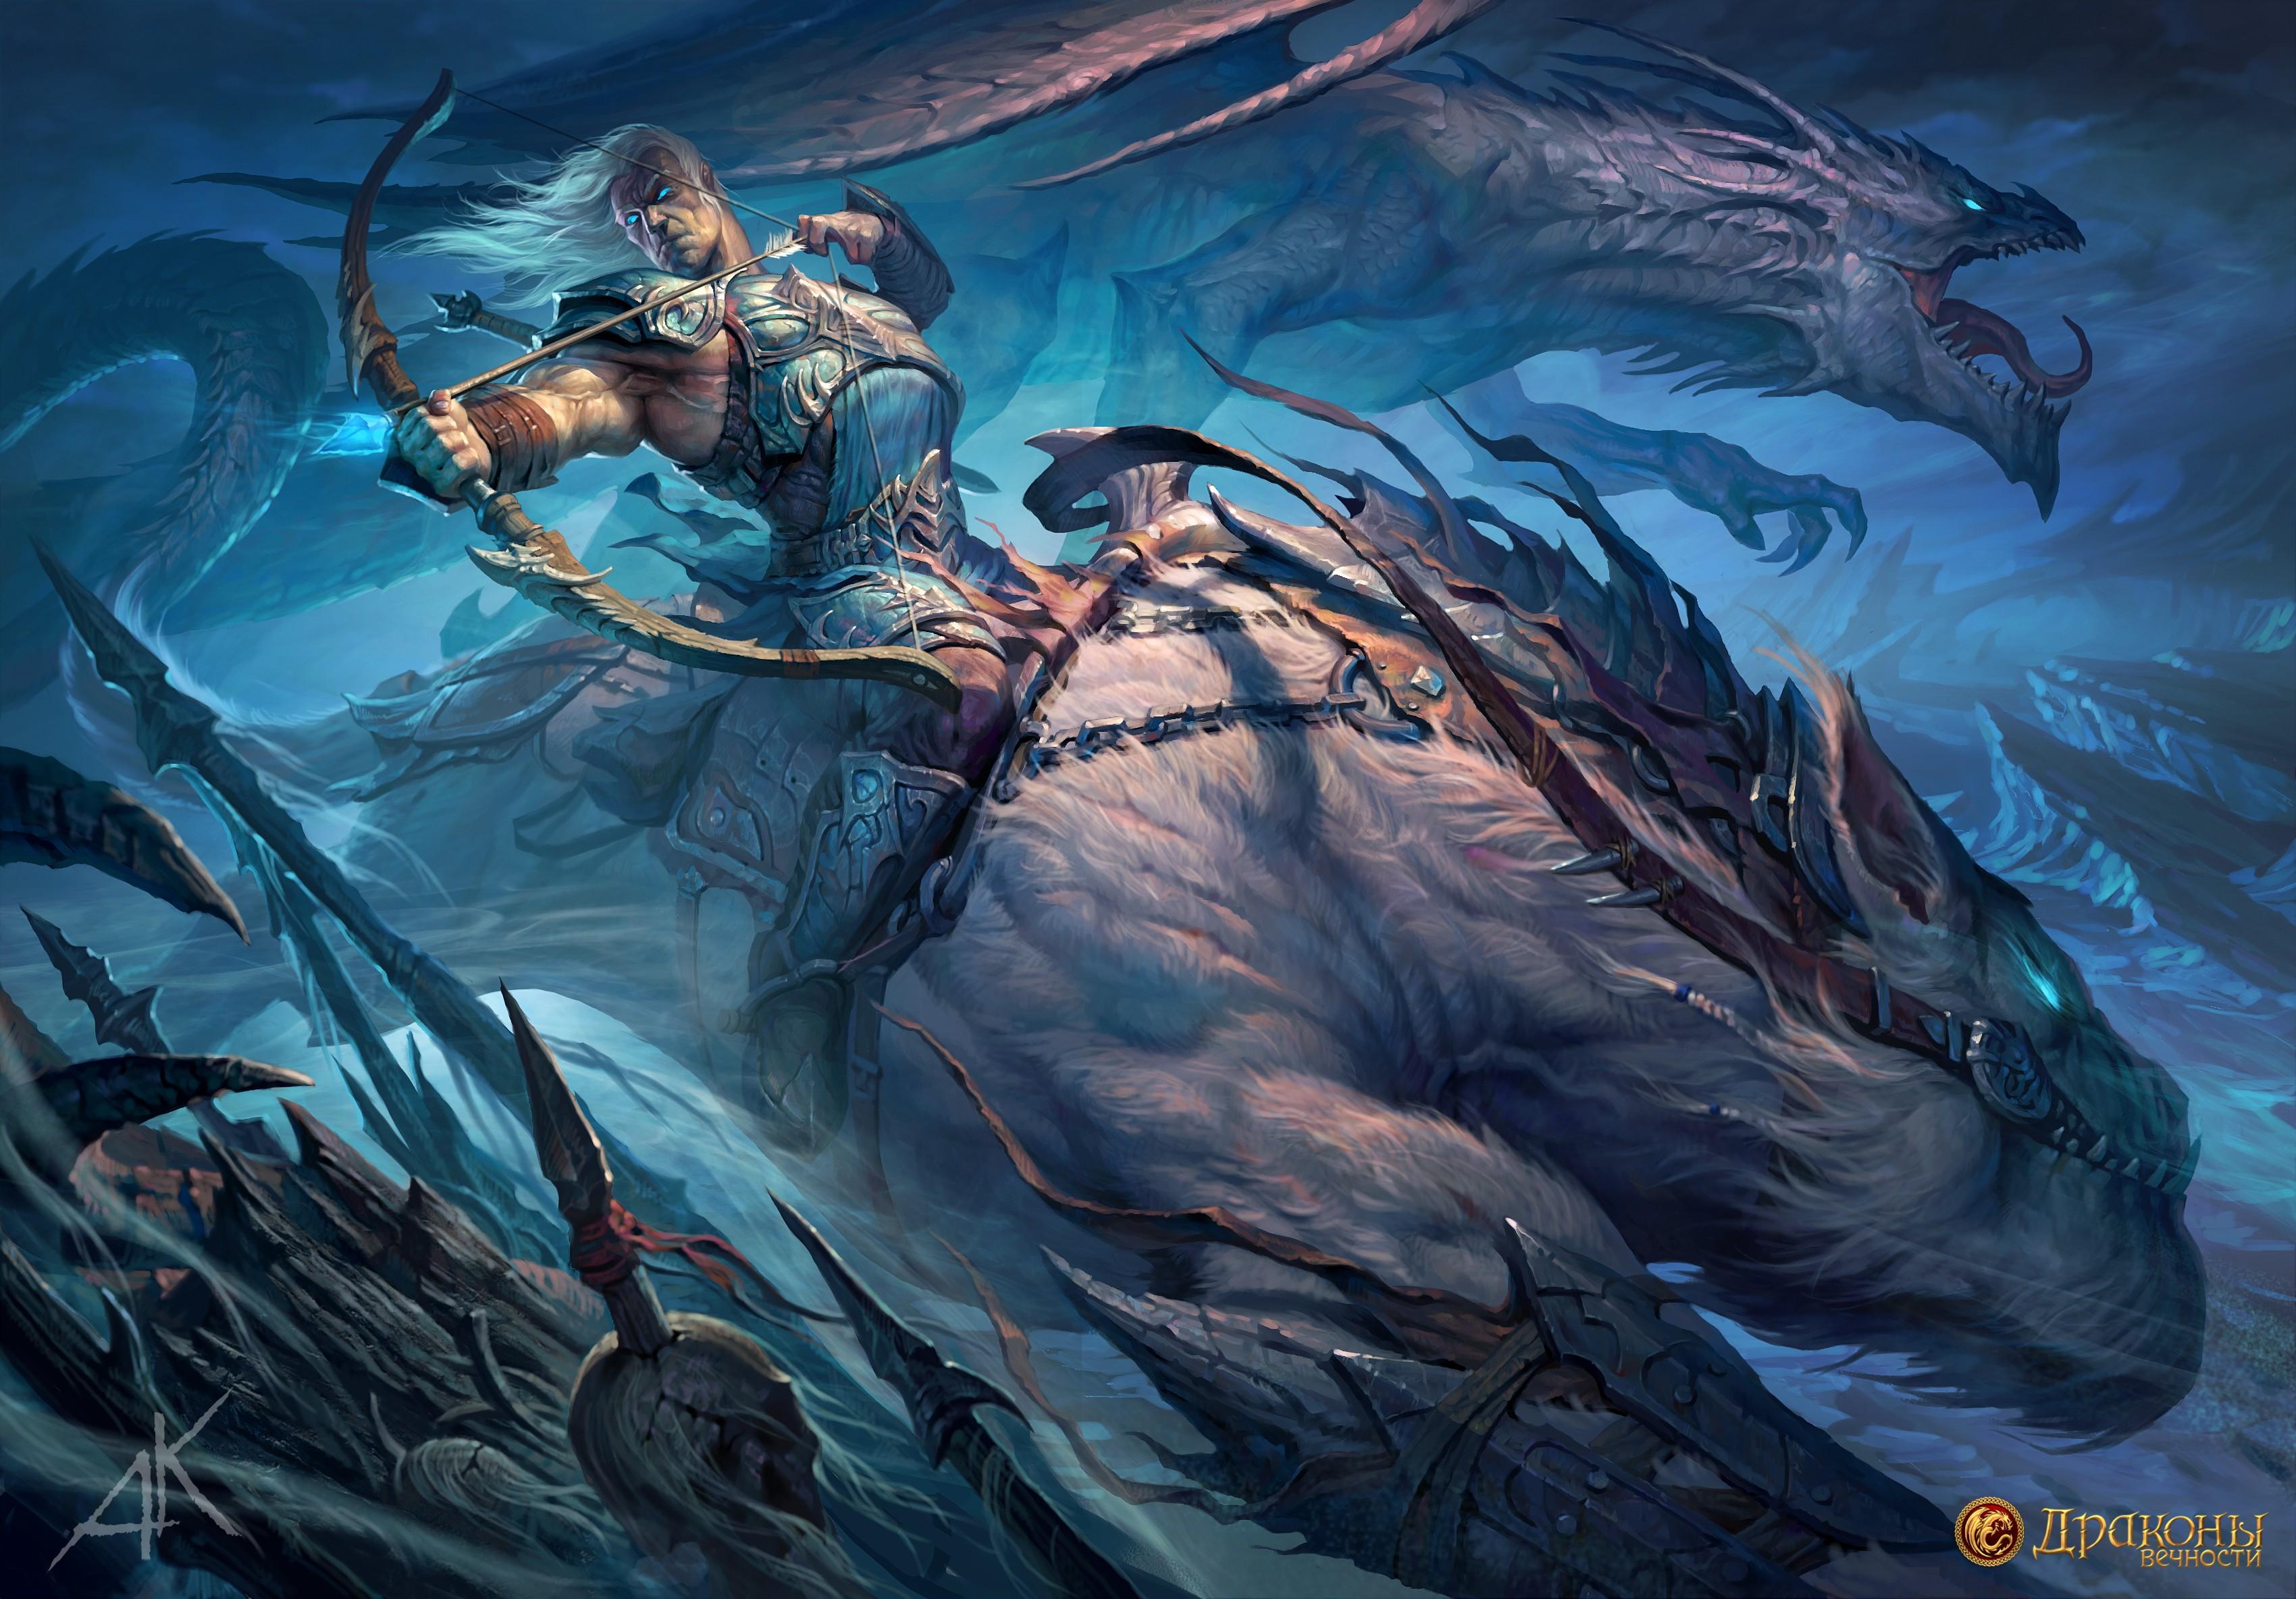 Illustration Fantasy Art Creature Bow Dragon Warrior Archer Mythology Ghost Ship Screenshot Computer Wallpaper Fictional Character